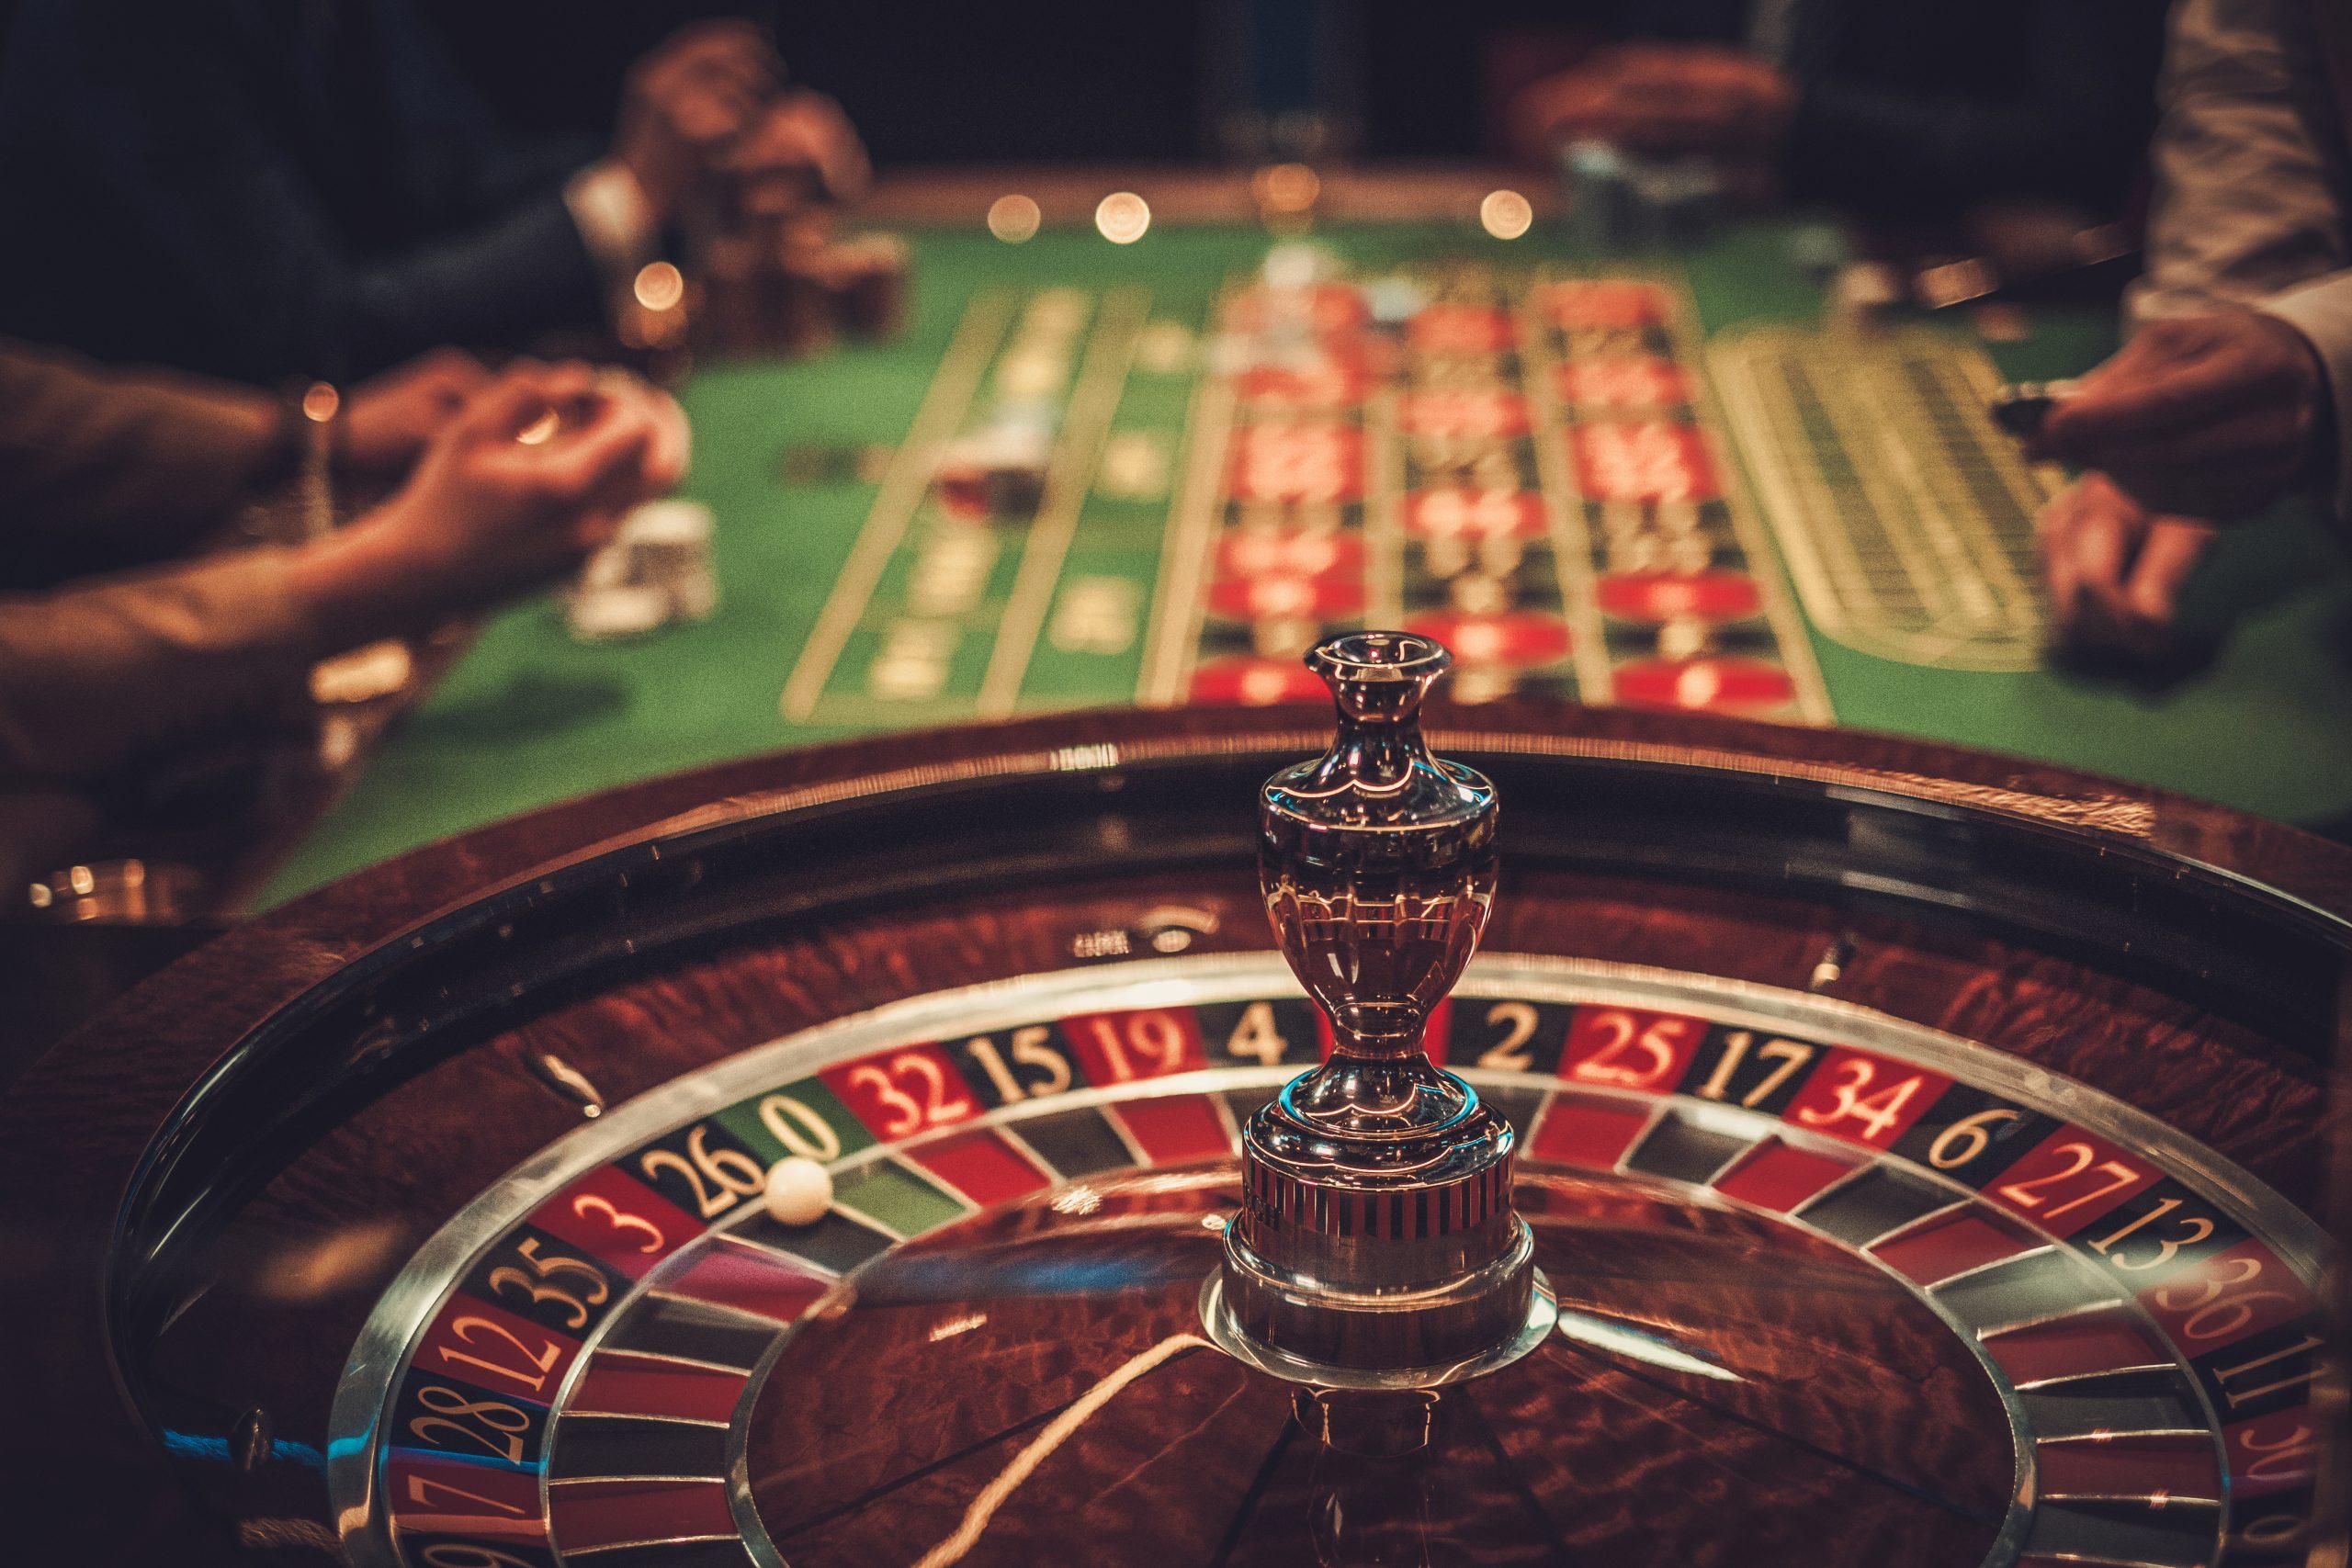 Casino staff vacancy for manager, supervisor, inspector, dealer